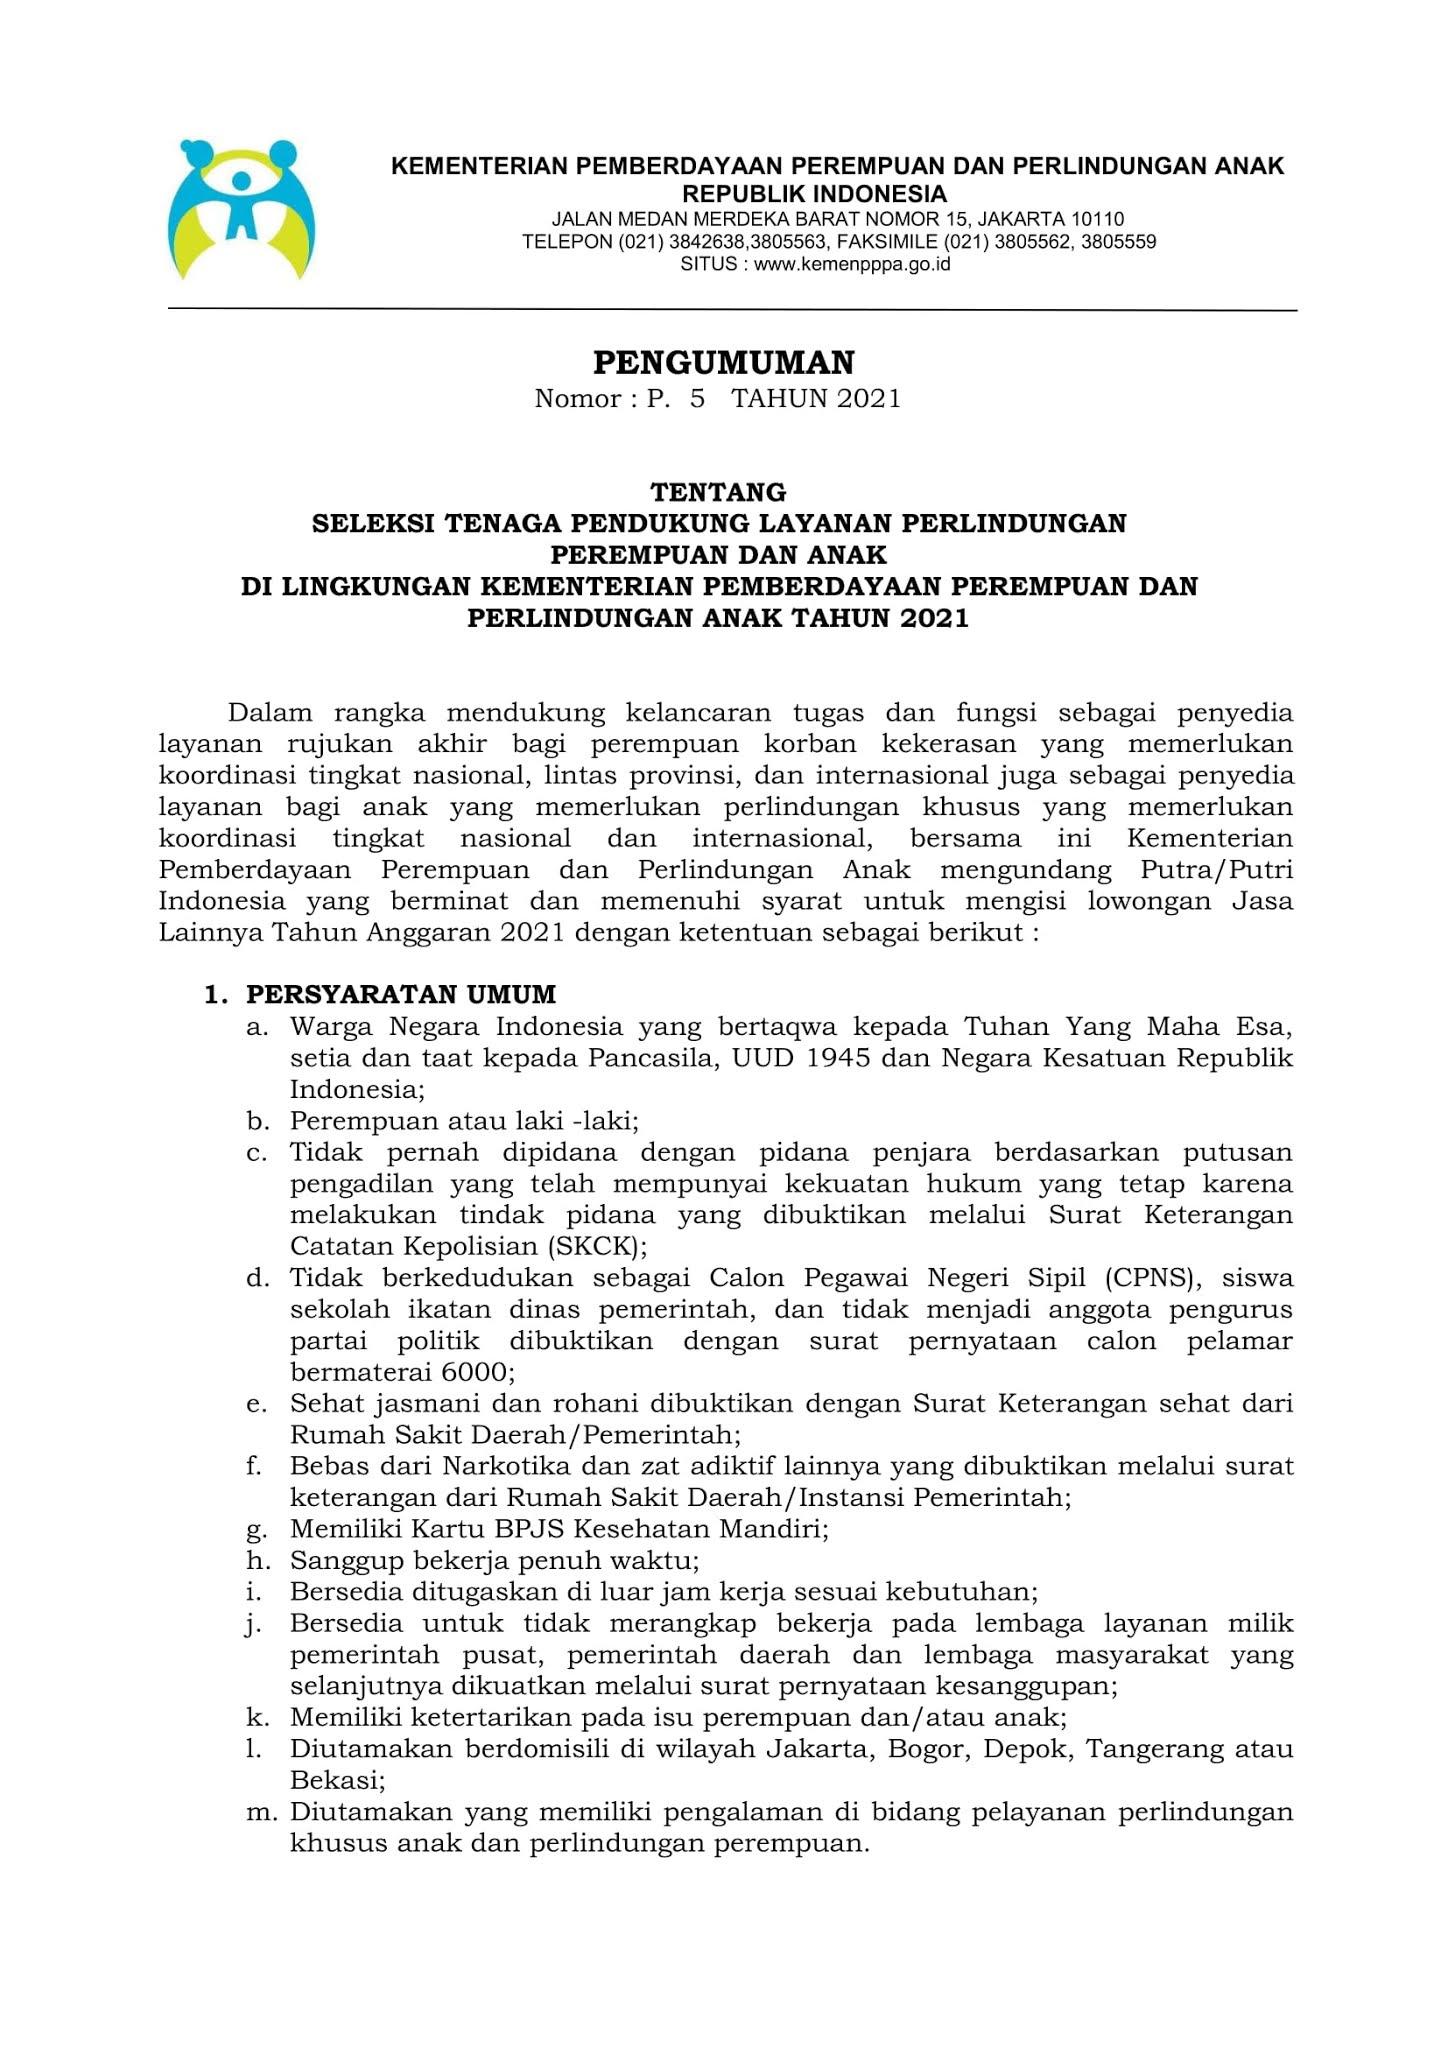 Lowongan Kerja Tenaga Kementerian Pemberdayaan Perempuan dan Perlindungan Anak (KPPA) Tahun 2021